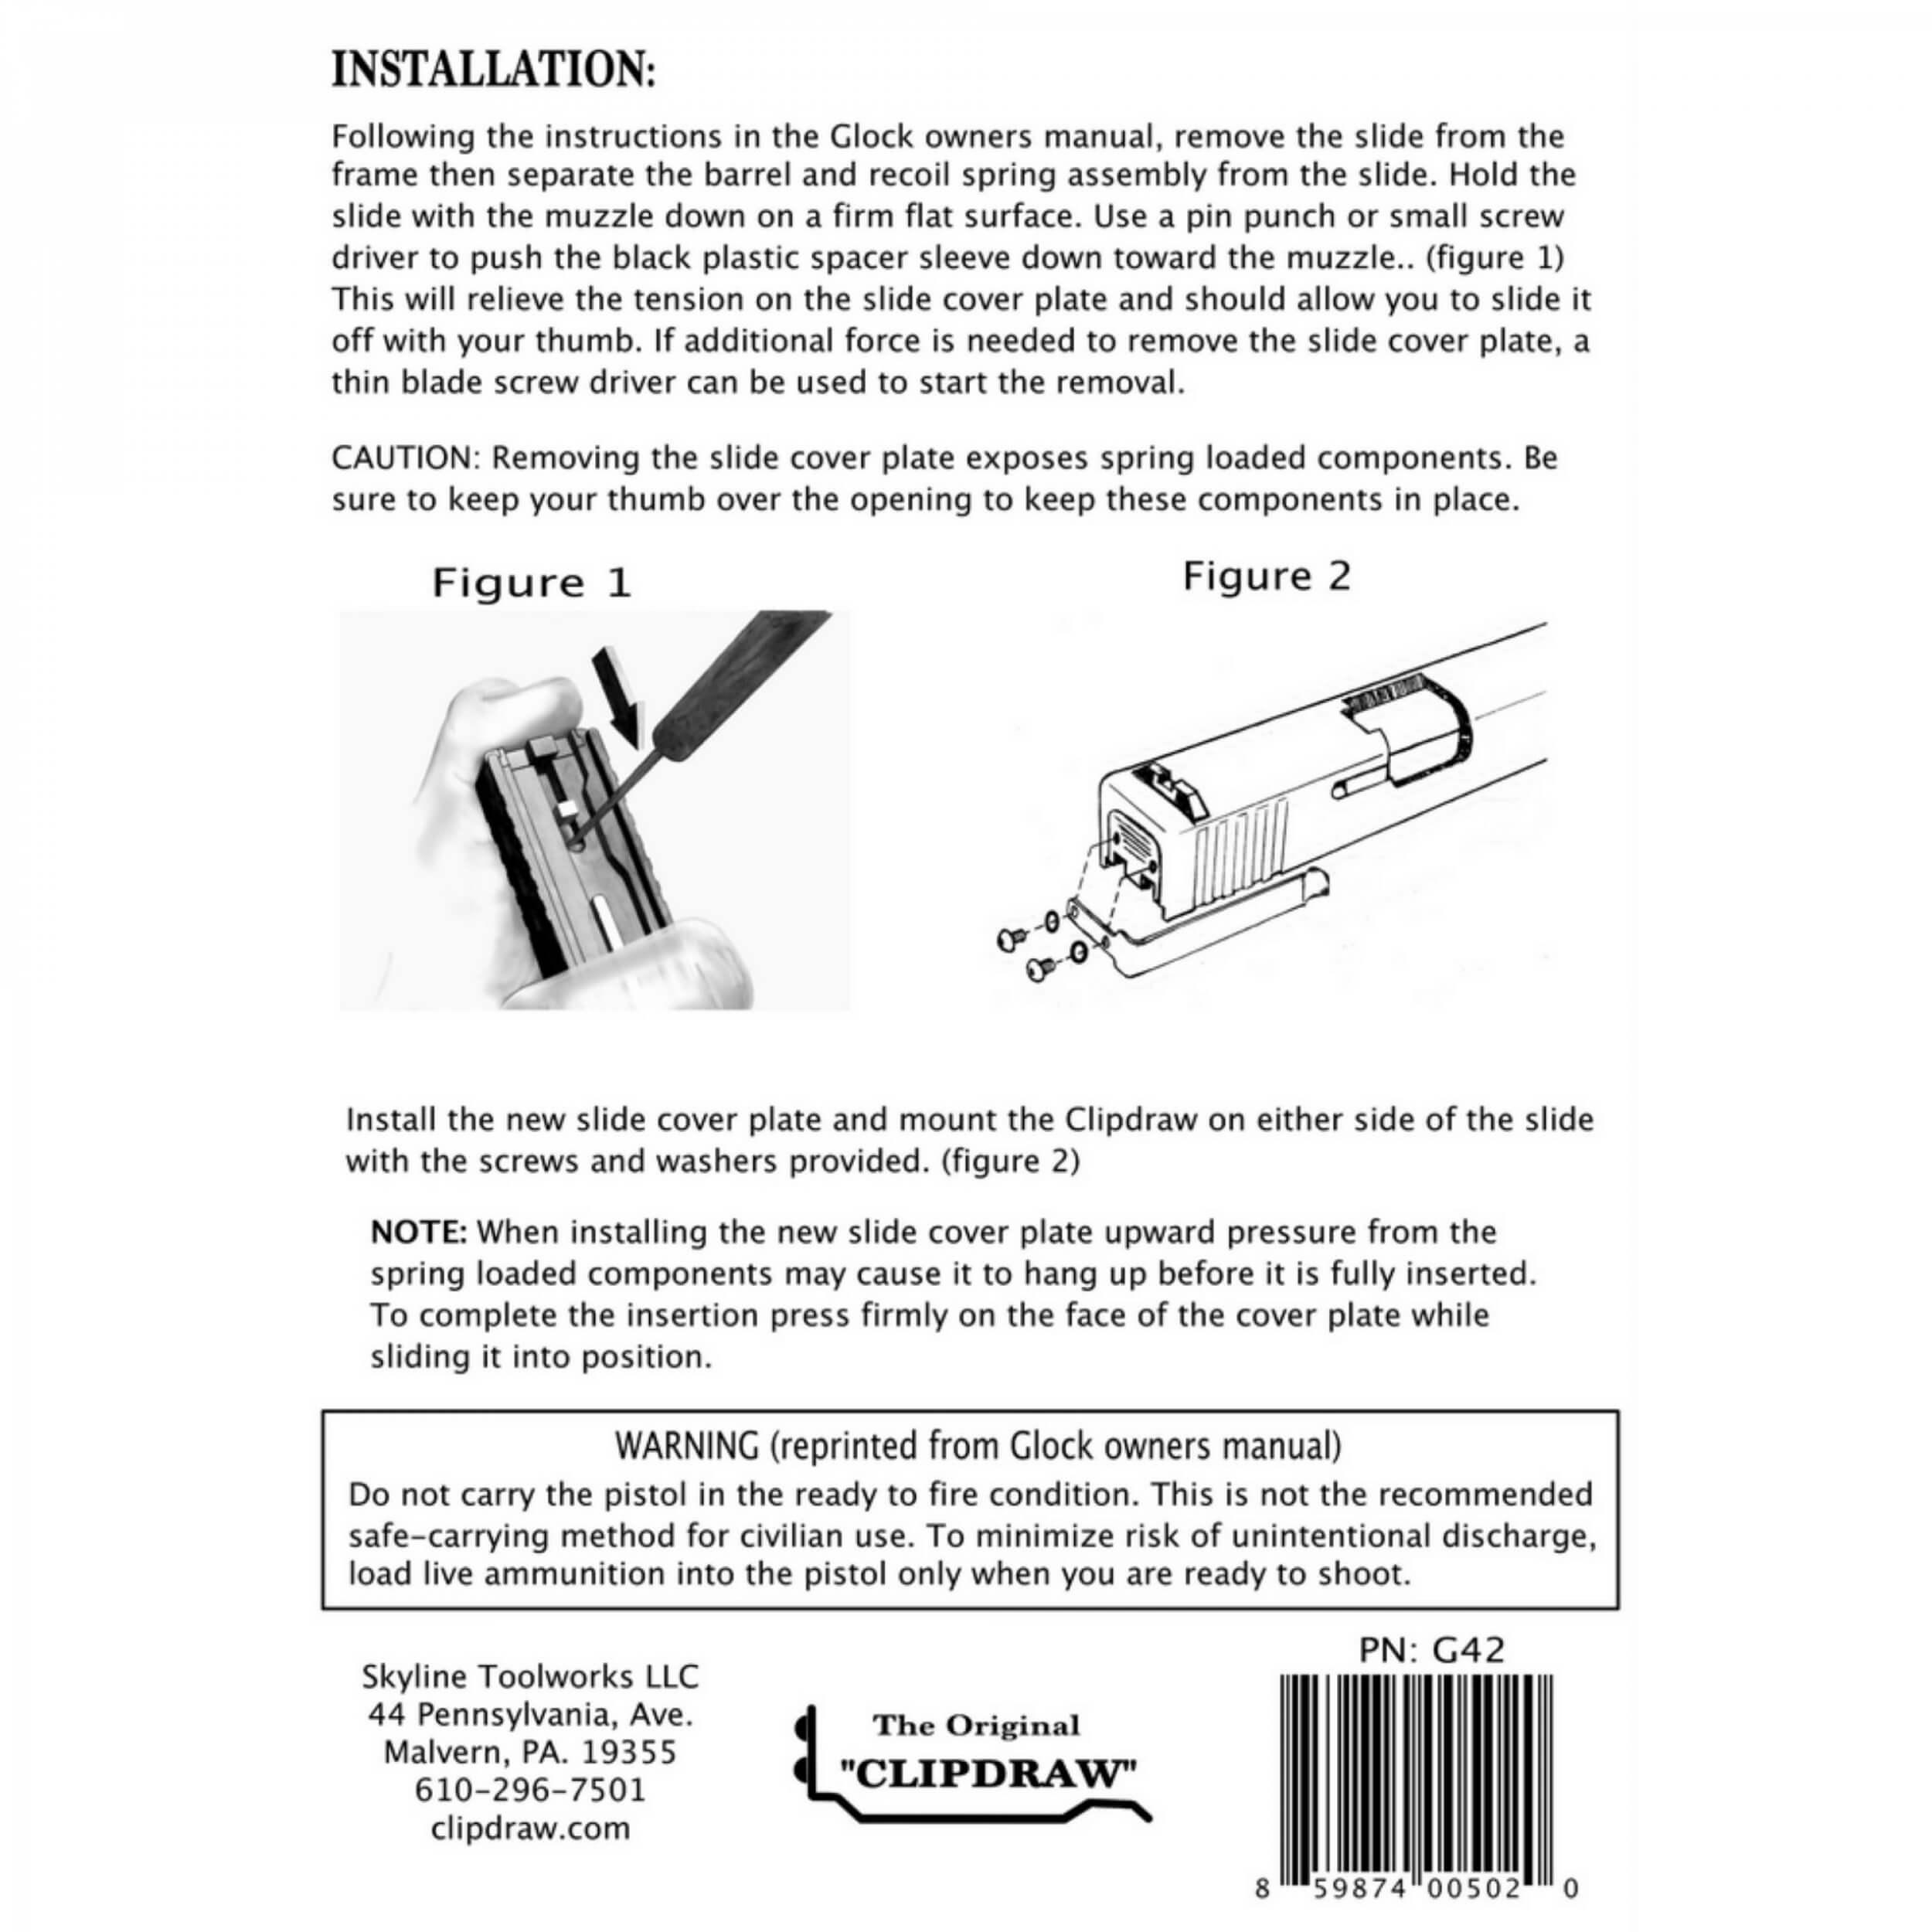 IWB Clip Holster Glock 17 / 19 / 19X / 22 / 23 / 24 / 25 / 26 / 27 / 28 / 30S / 31 / 32 / 33 / 34 / 35 / 36 / 37 / 45